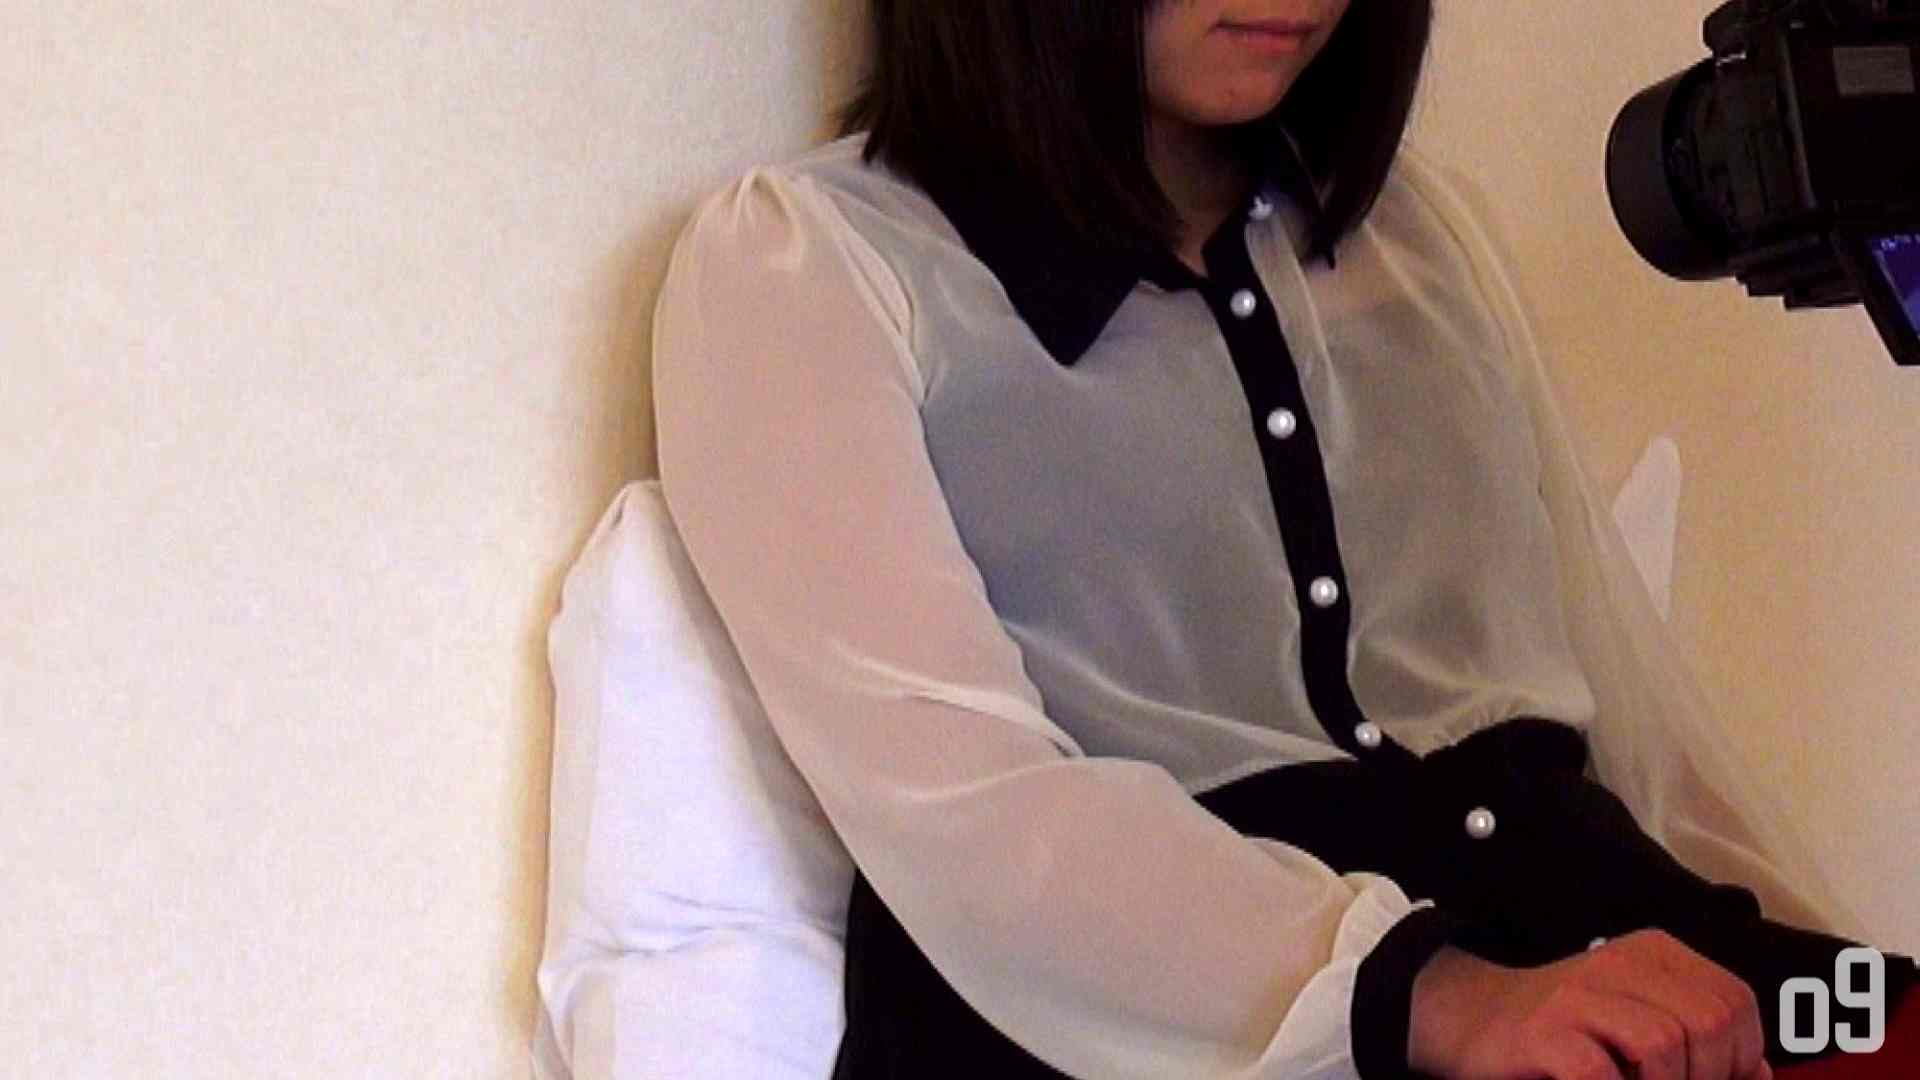 vol.1 撮影内容未確定の中、まずは私服姿撮り エッチなOL | 顔出しNG一般女性  80pic 55